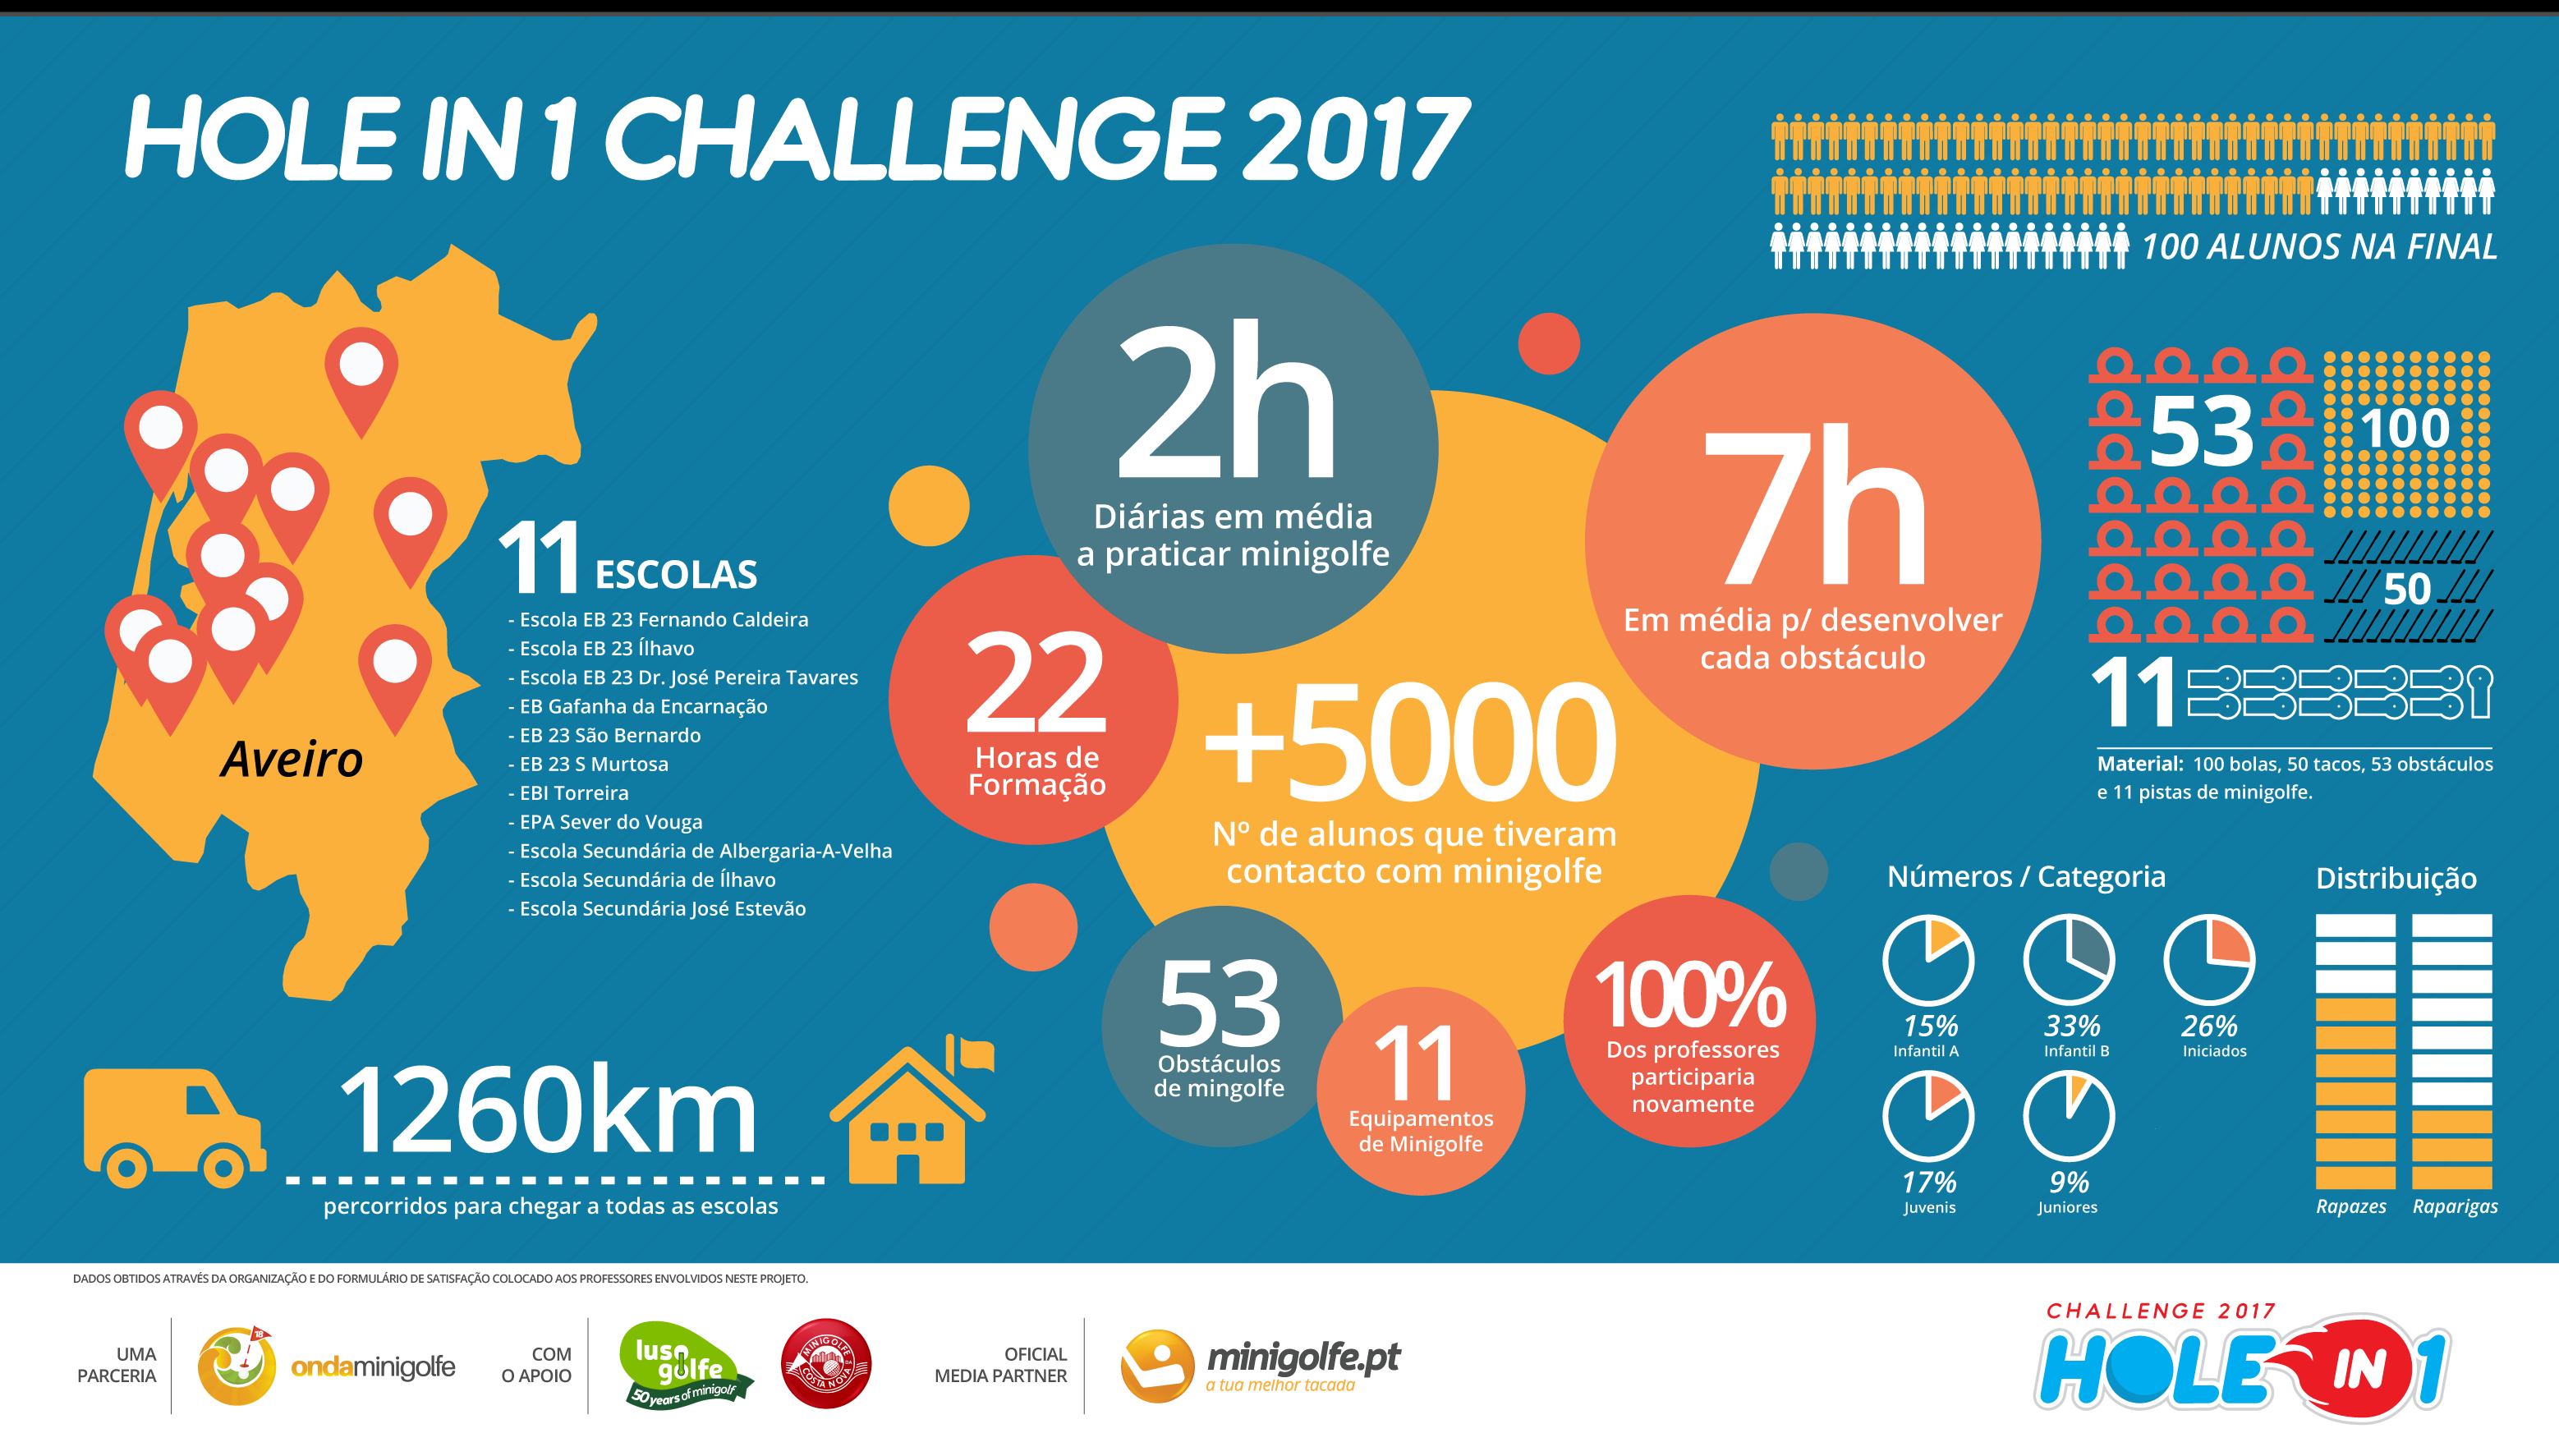 Hole in 1 Challenge-2017 Infografia